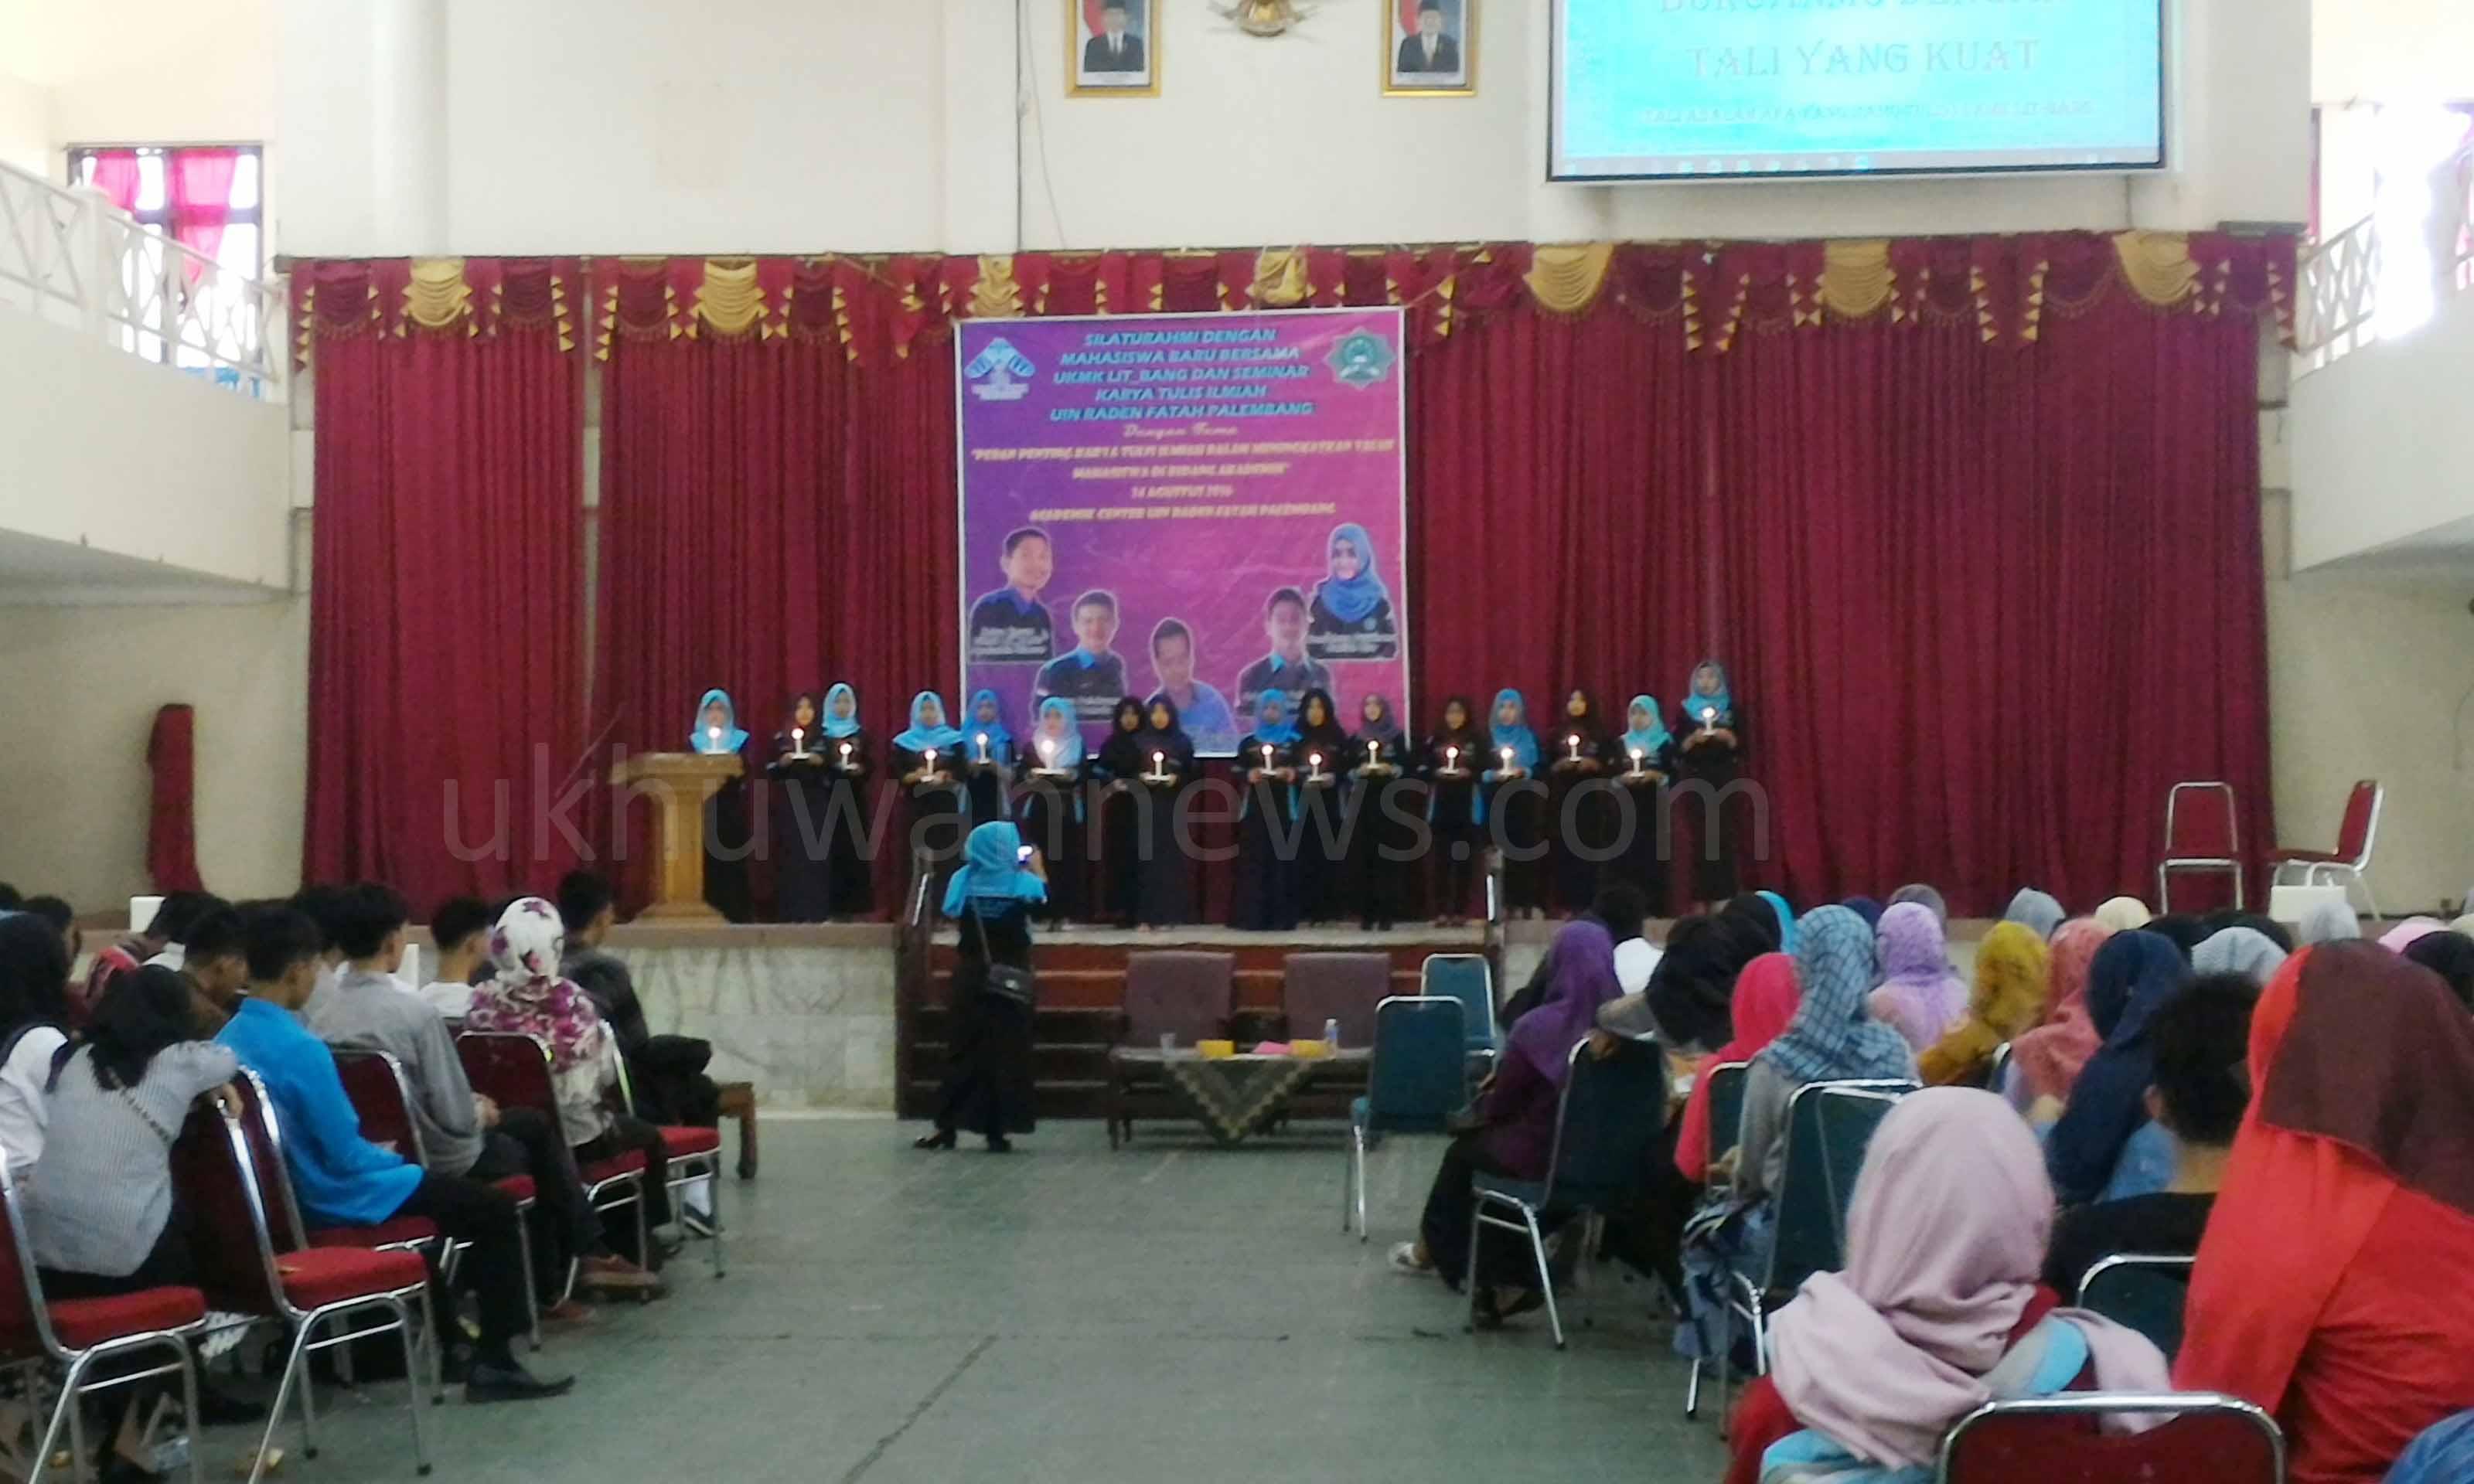 Anggota Litbang menampilkan musikalisasi puisi diakhir kegiatan seminar Karya Tulis Ilmiah di gedung Akademik Center (AC) UIN RF. Ukhuwahnews/Rajab